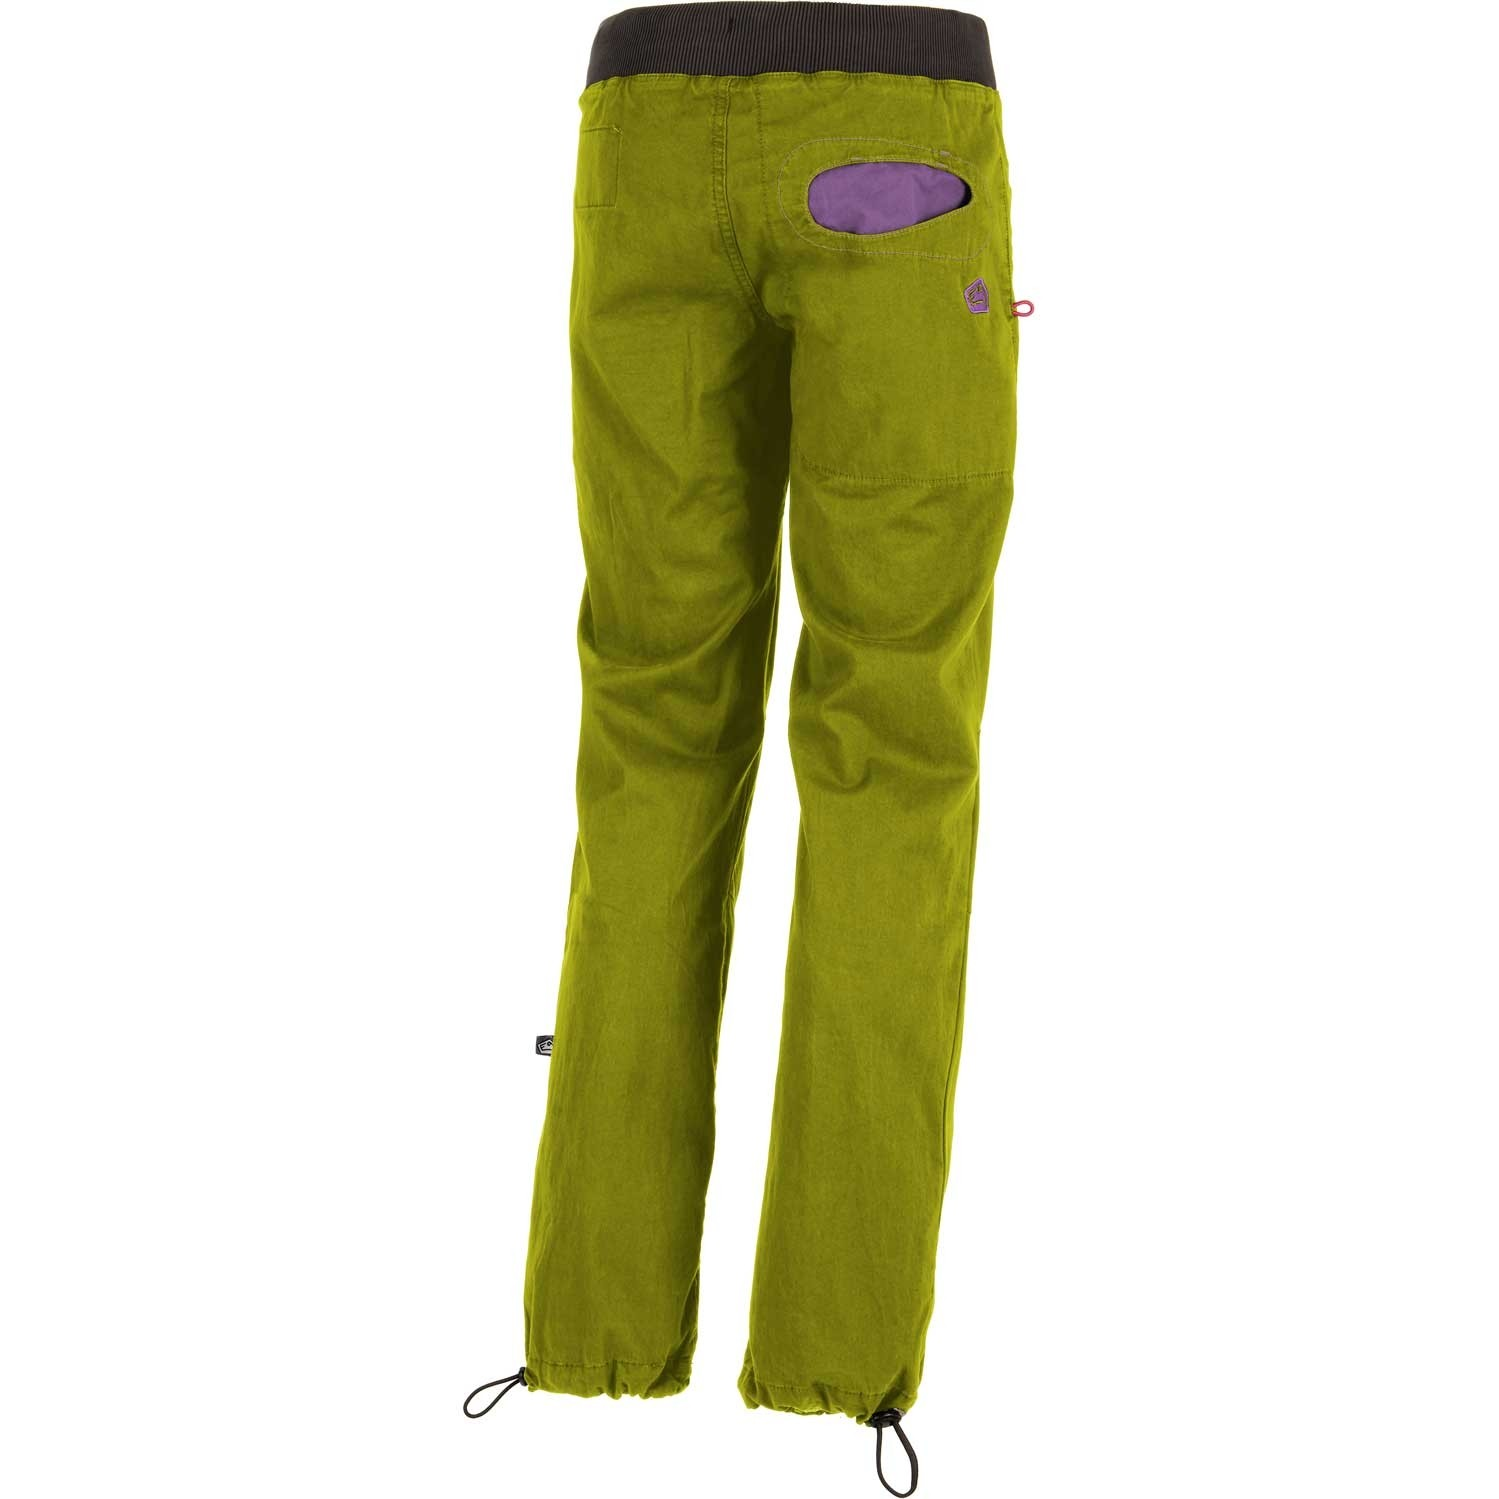 E9 Onda Story Pants - Women's - Apple